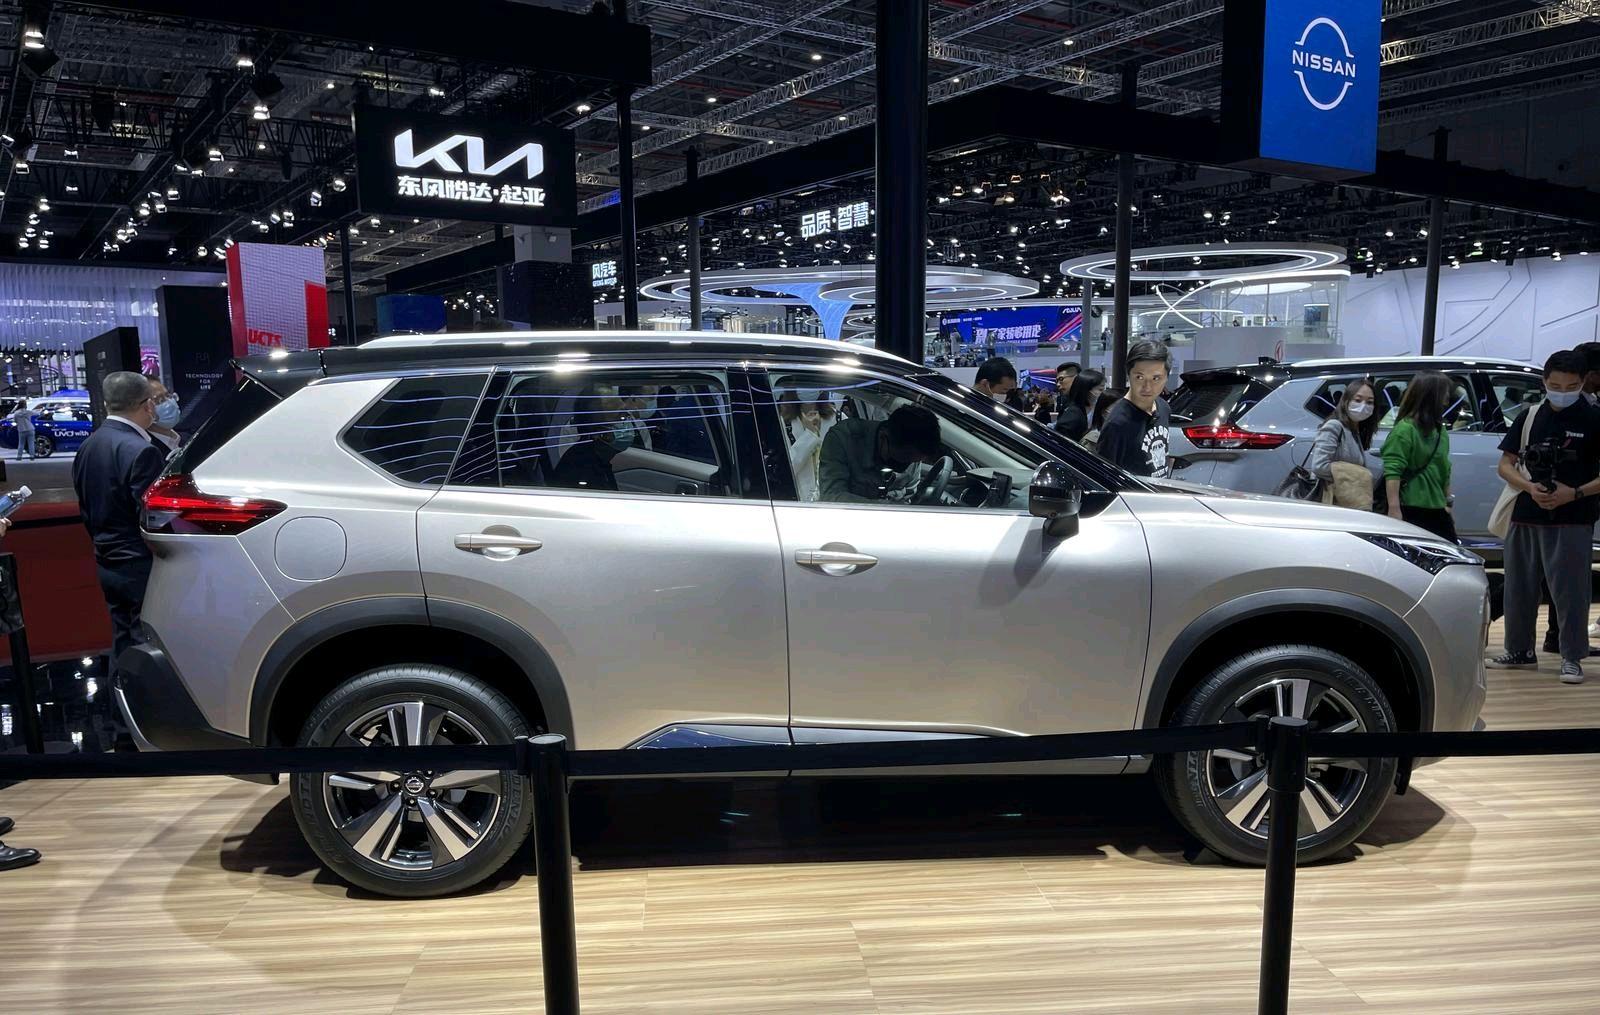 1.5T三缸+CVT,全新日产奇骏实拍,欧蓝德同平台+AWD真霸气